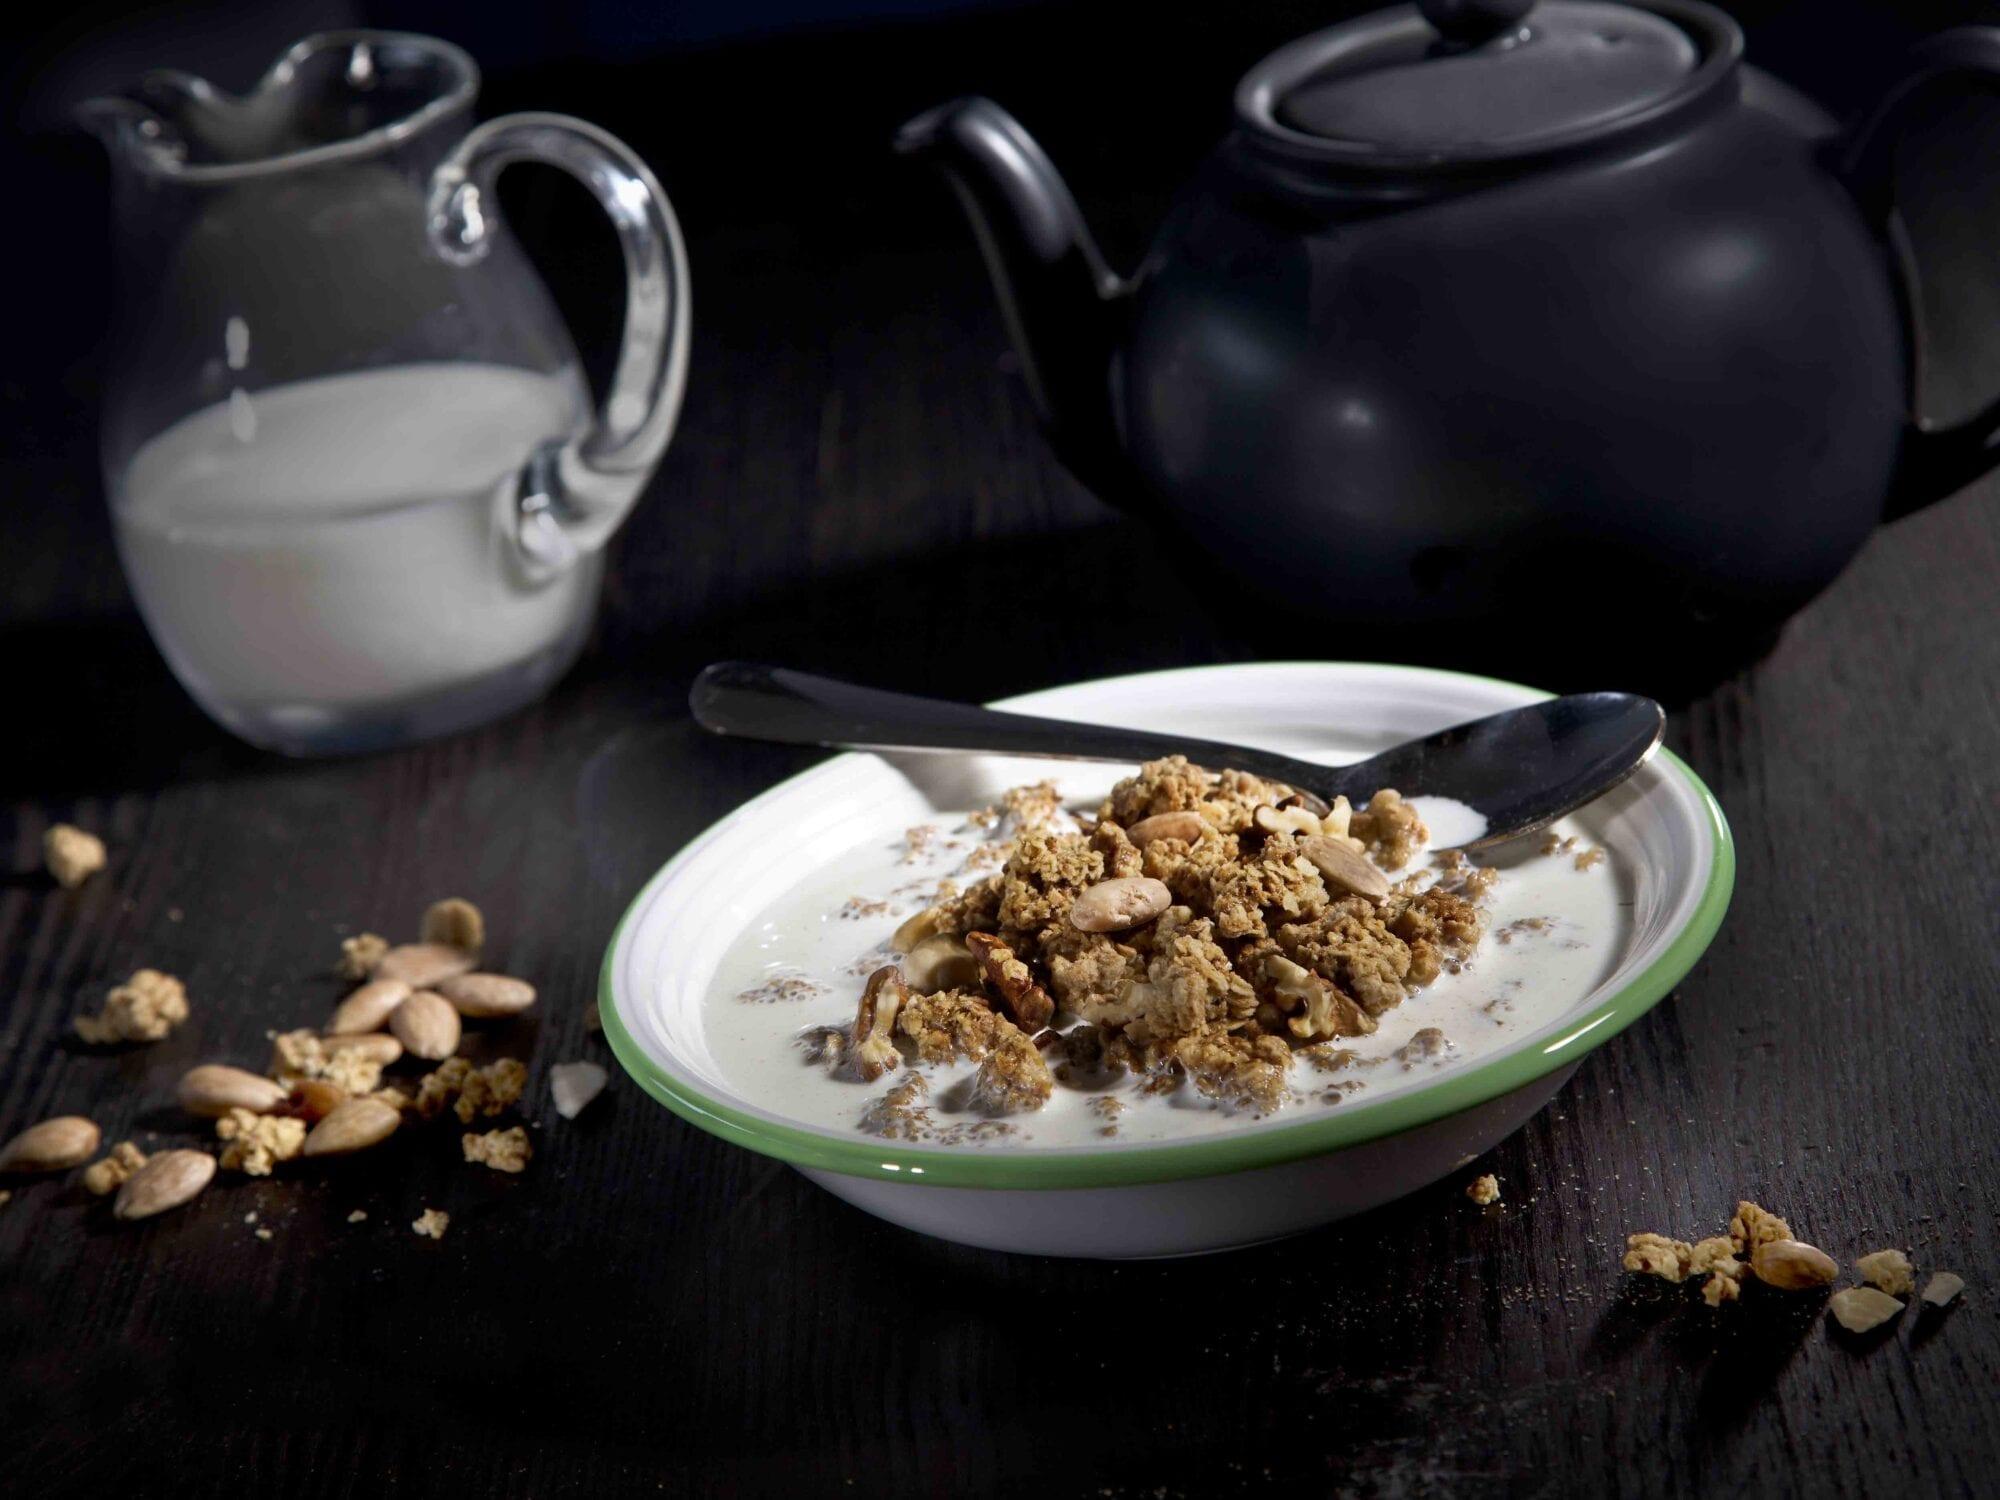 Honningristet mysli paa yoghurt